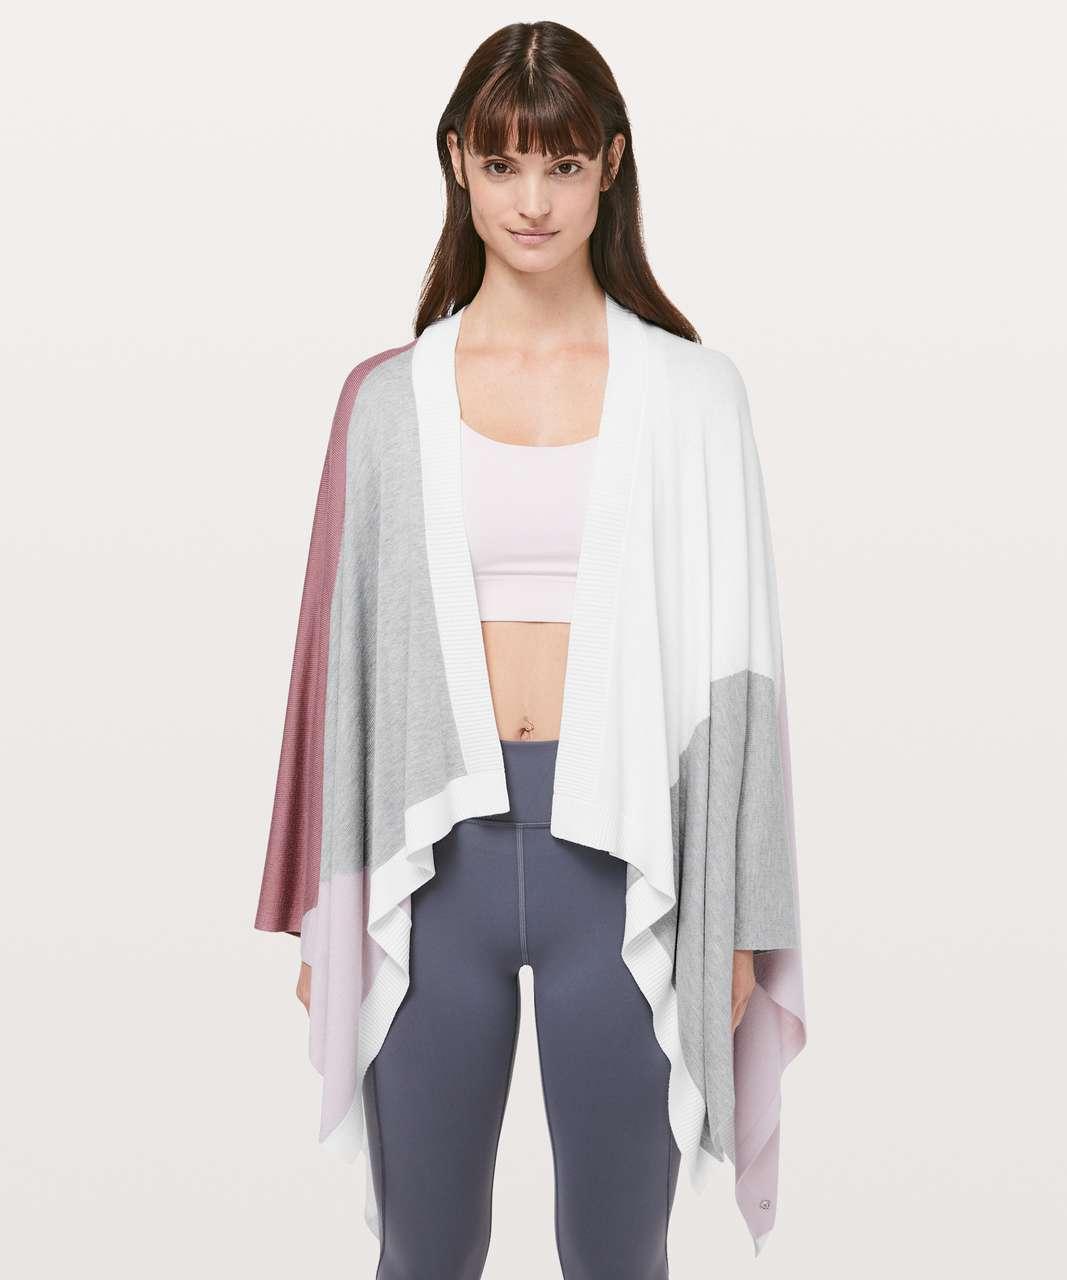 Lululemon Hatha Wrap - Quicksand / Misty Pink / White / Heathered Core Light Grey